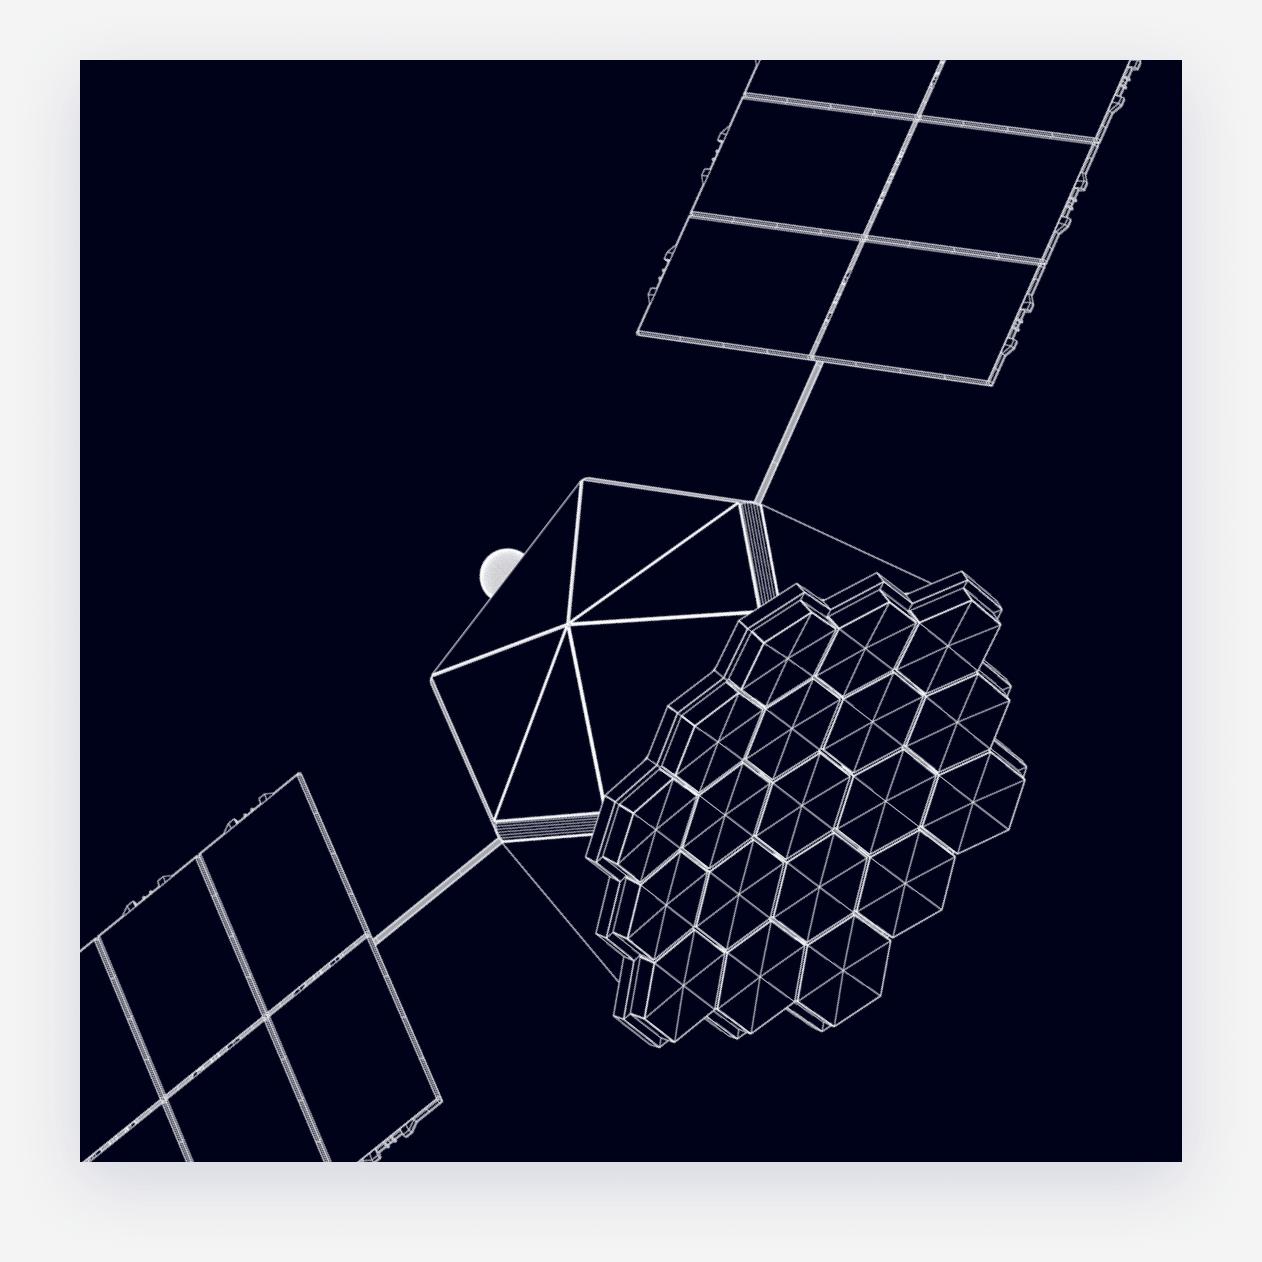 Blueprint of the satellite